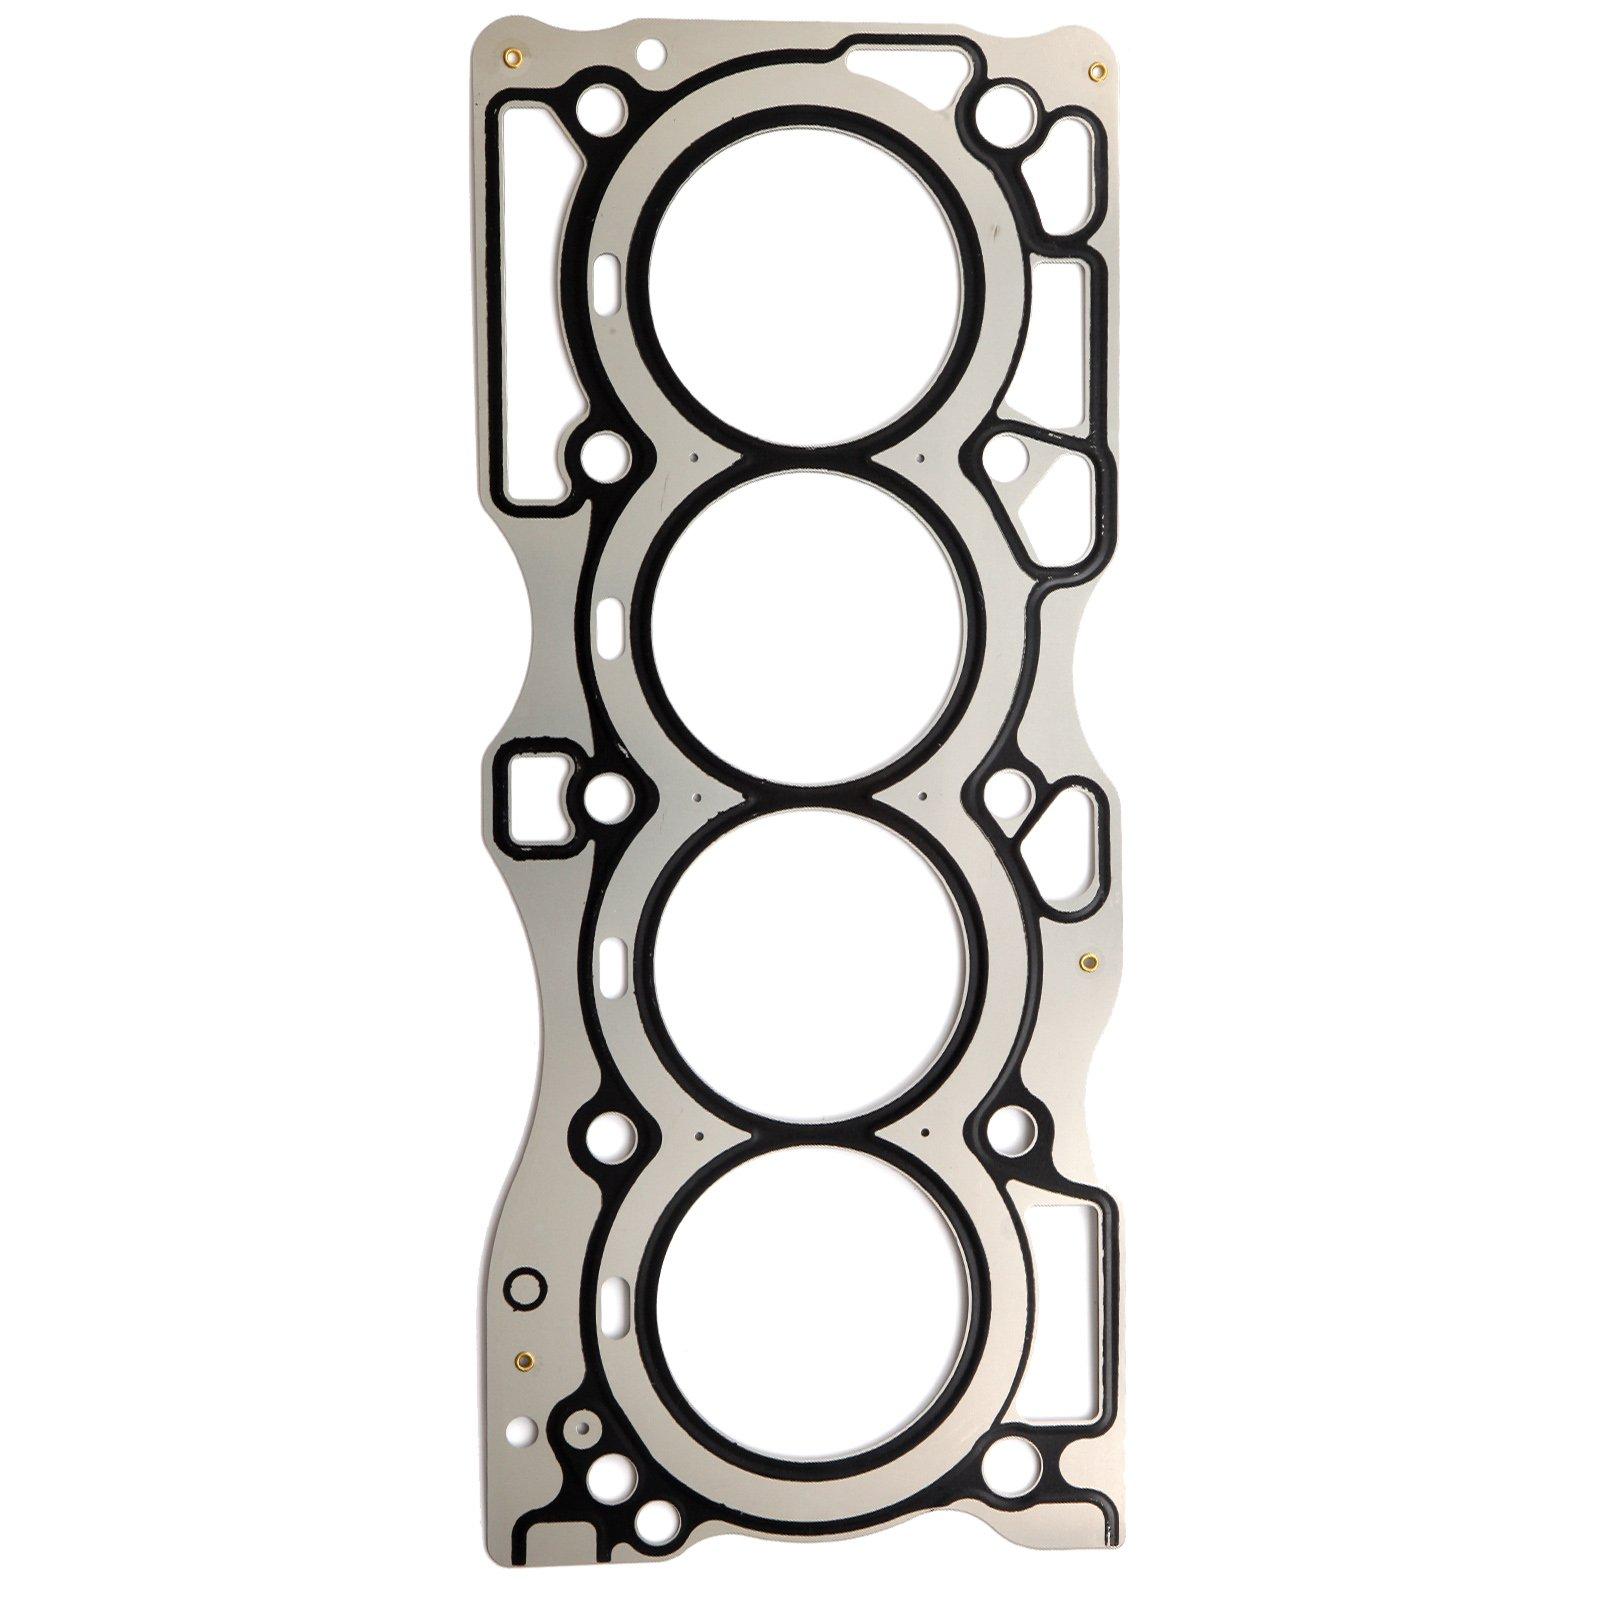 ECCPP Compatible fit for Head Gasket Set 2002-2006 Nissan Altima Sentra SE-R Engine Head Gaskets Kit